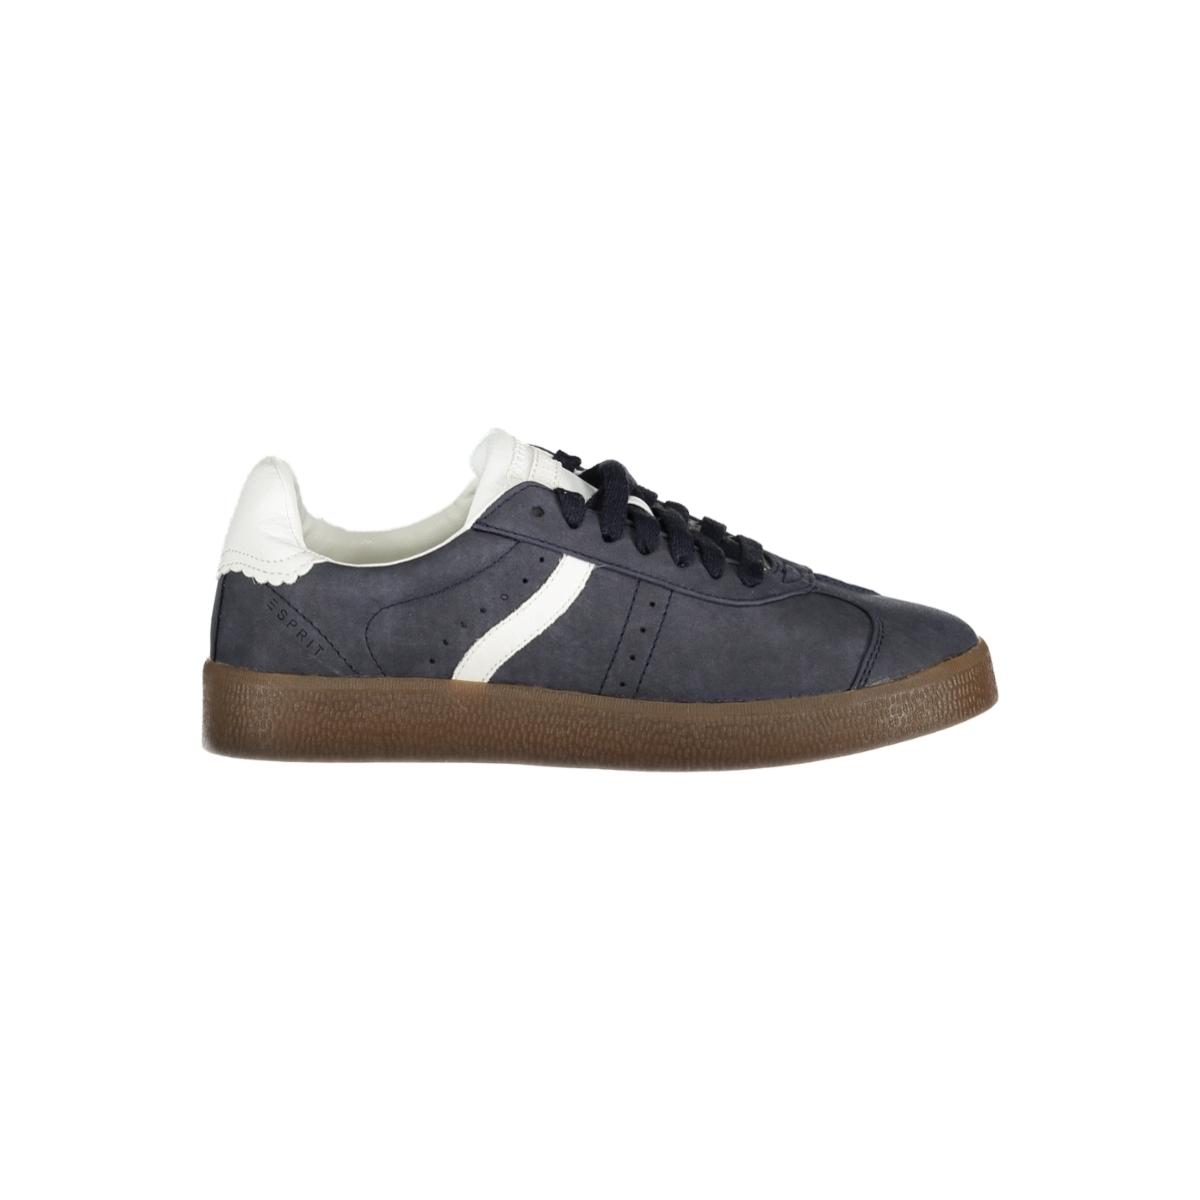 097ek1w023 esprit sneaker e400